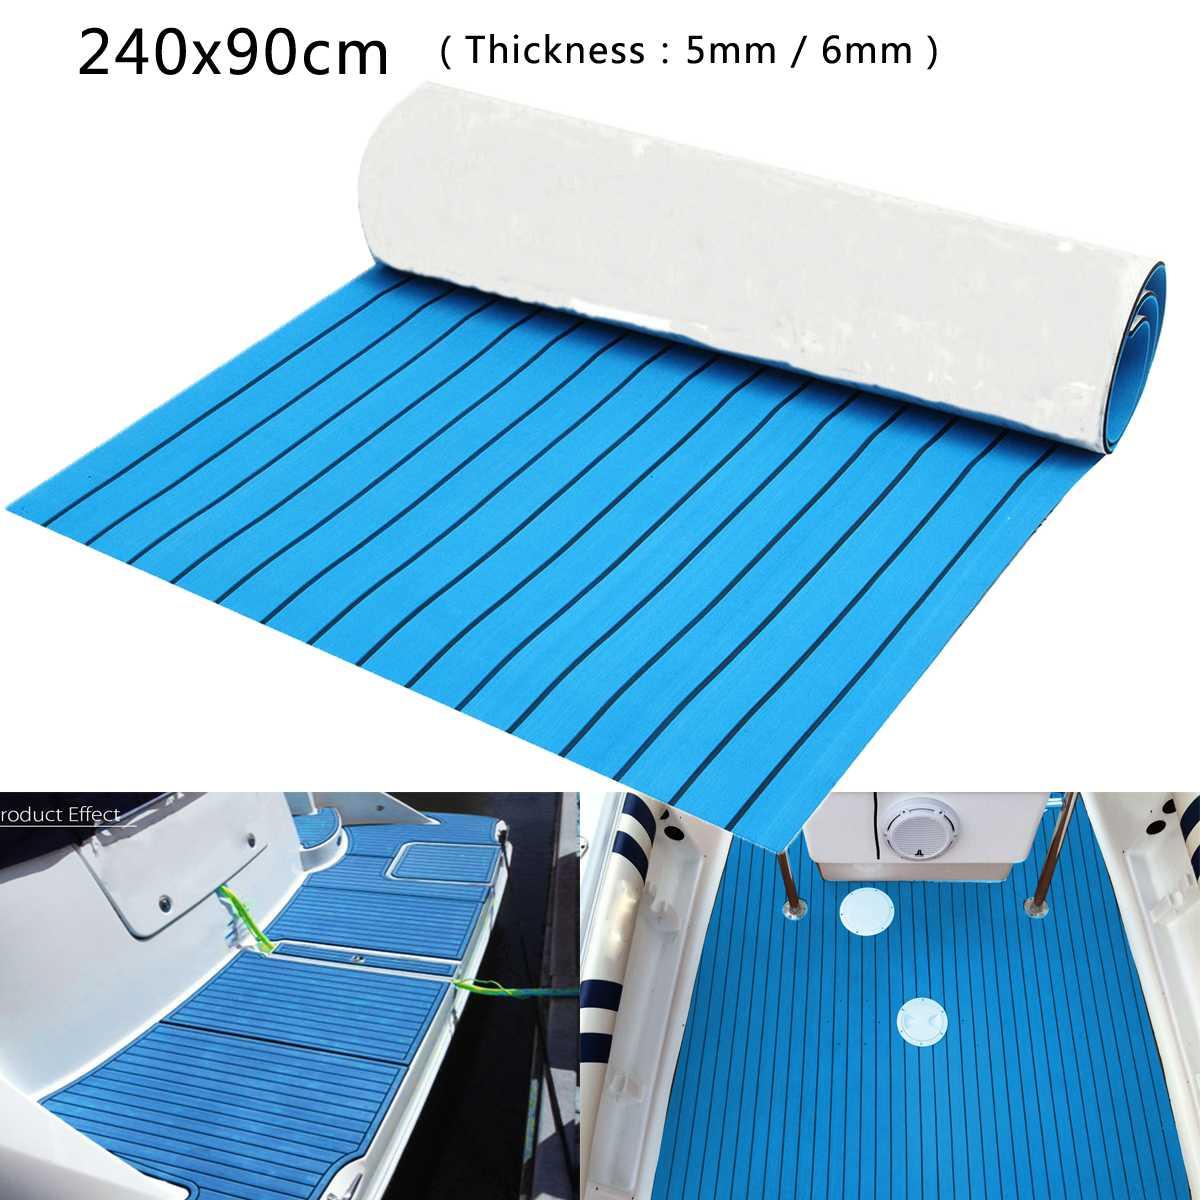 5mm/6mm 240x90cm EVA Foam Boat Flooring Faux Teak Decking Sheet Pad For Yacht RV CAR Boat Blue Black Lines